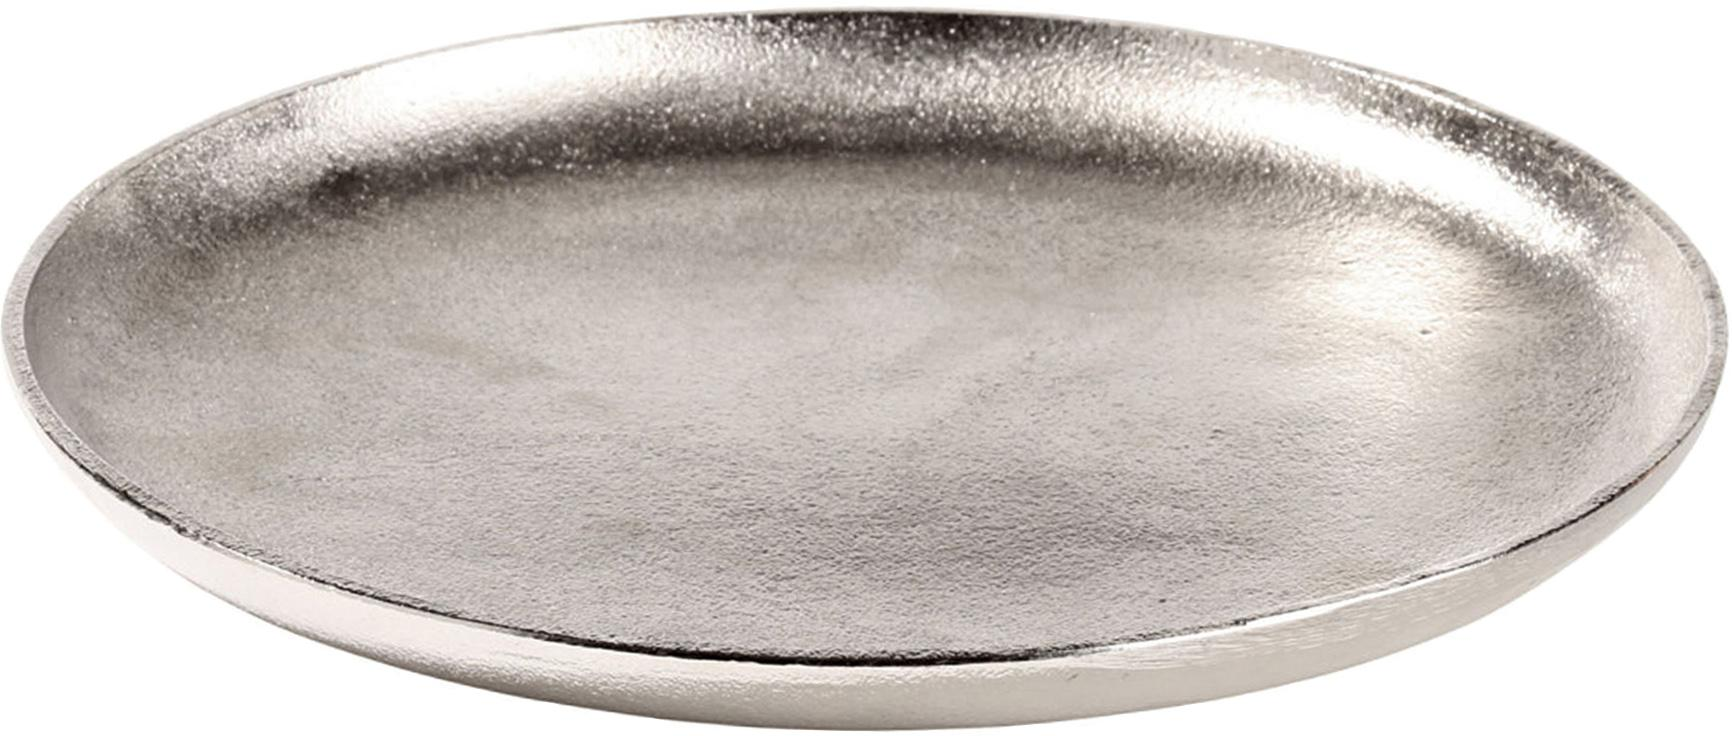 Bandeja decorativa Bintel, Aluminio, Plateado, Ø 35 cm